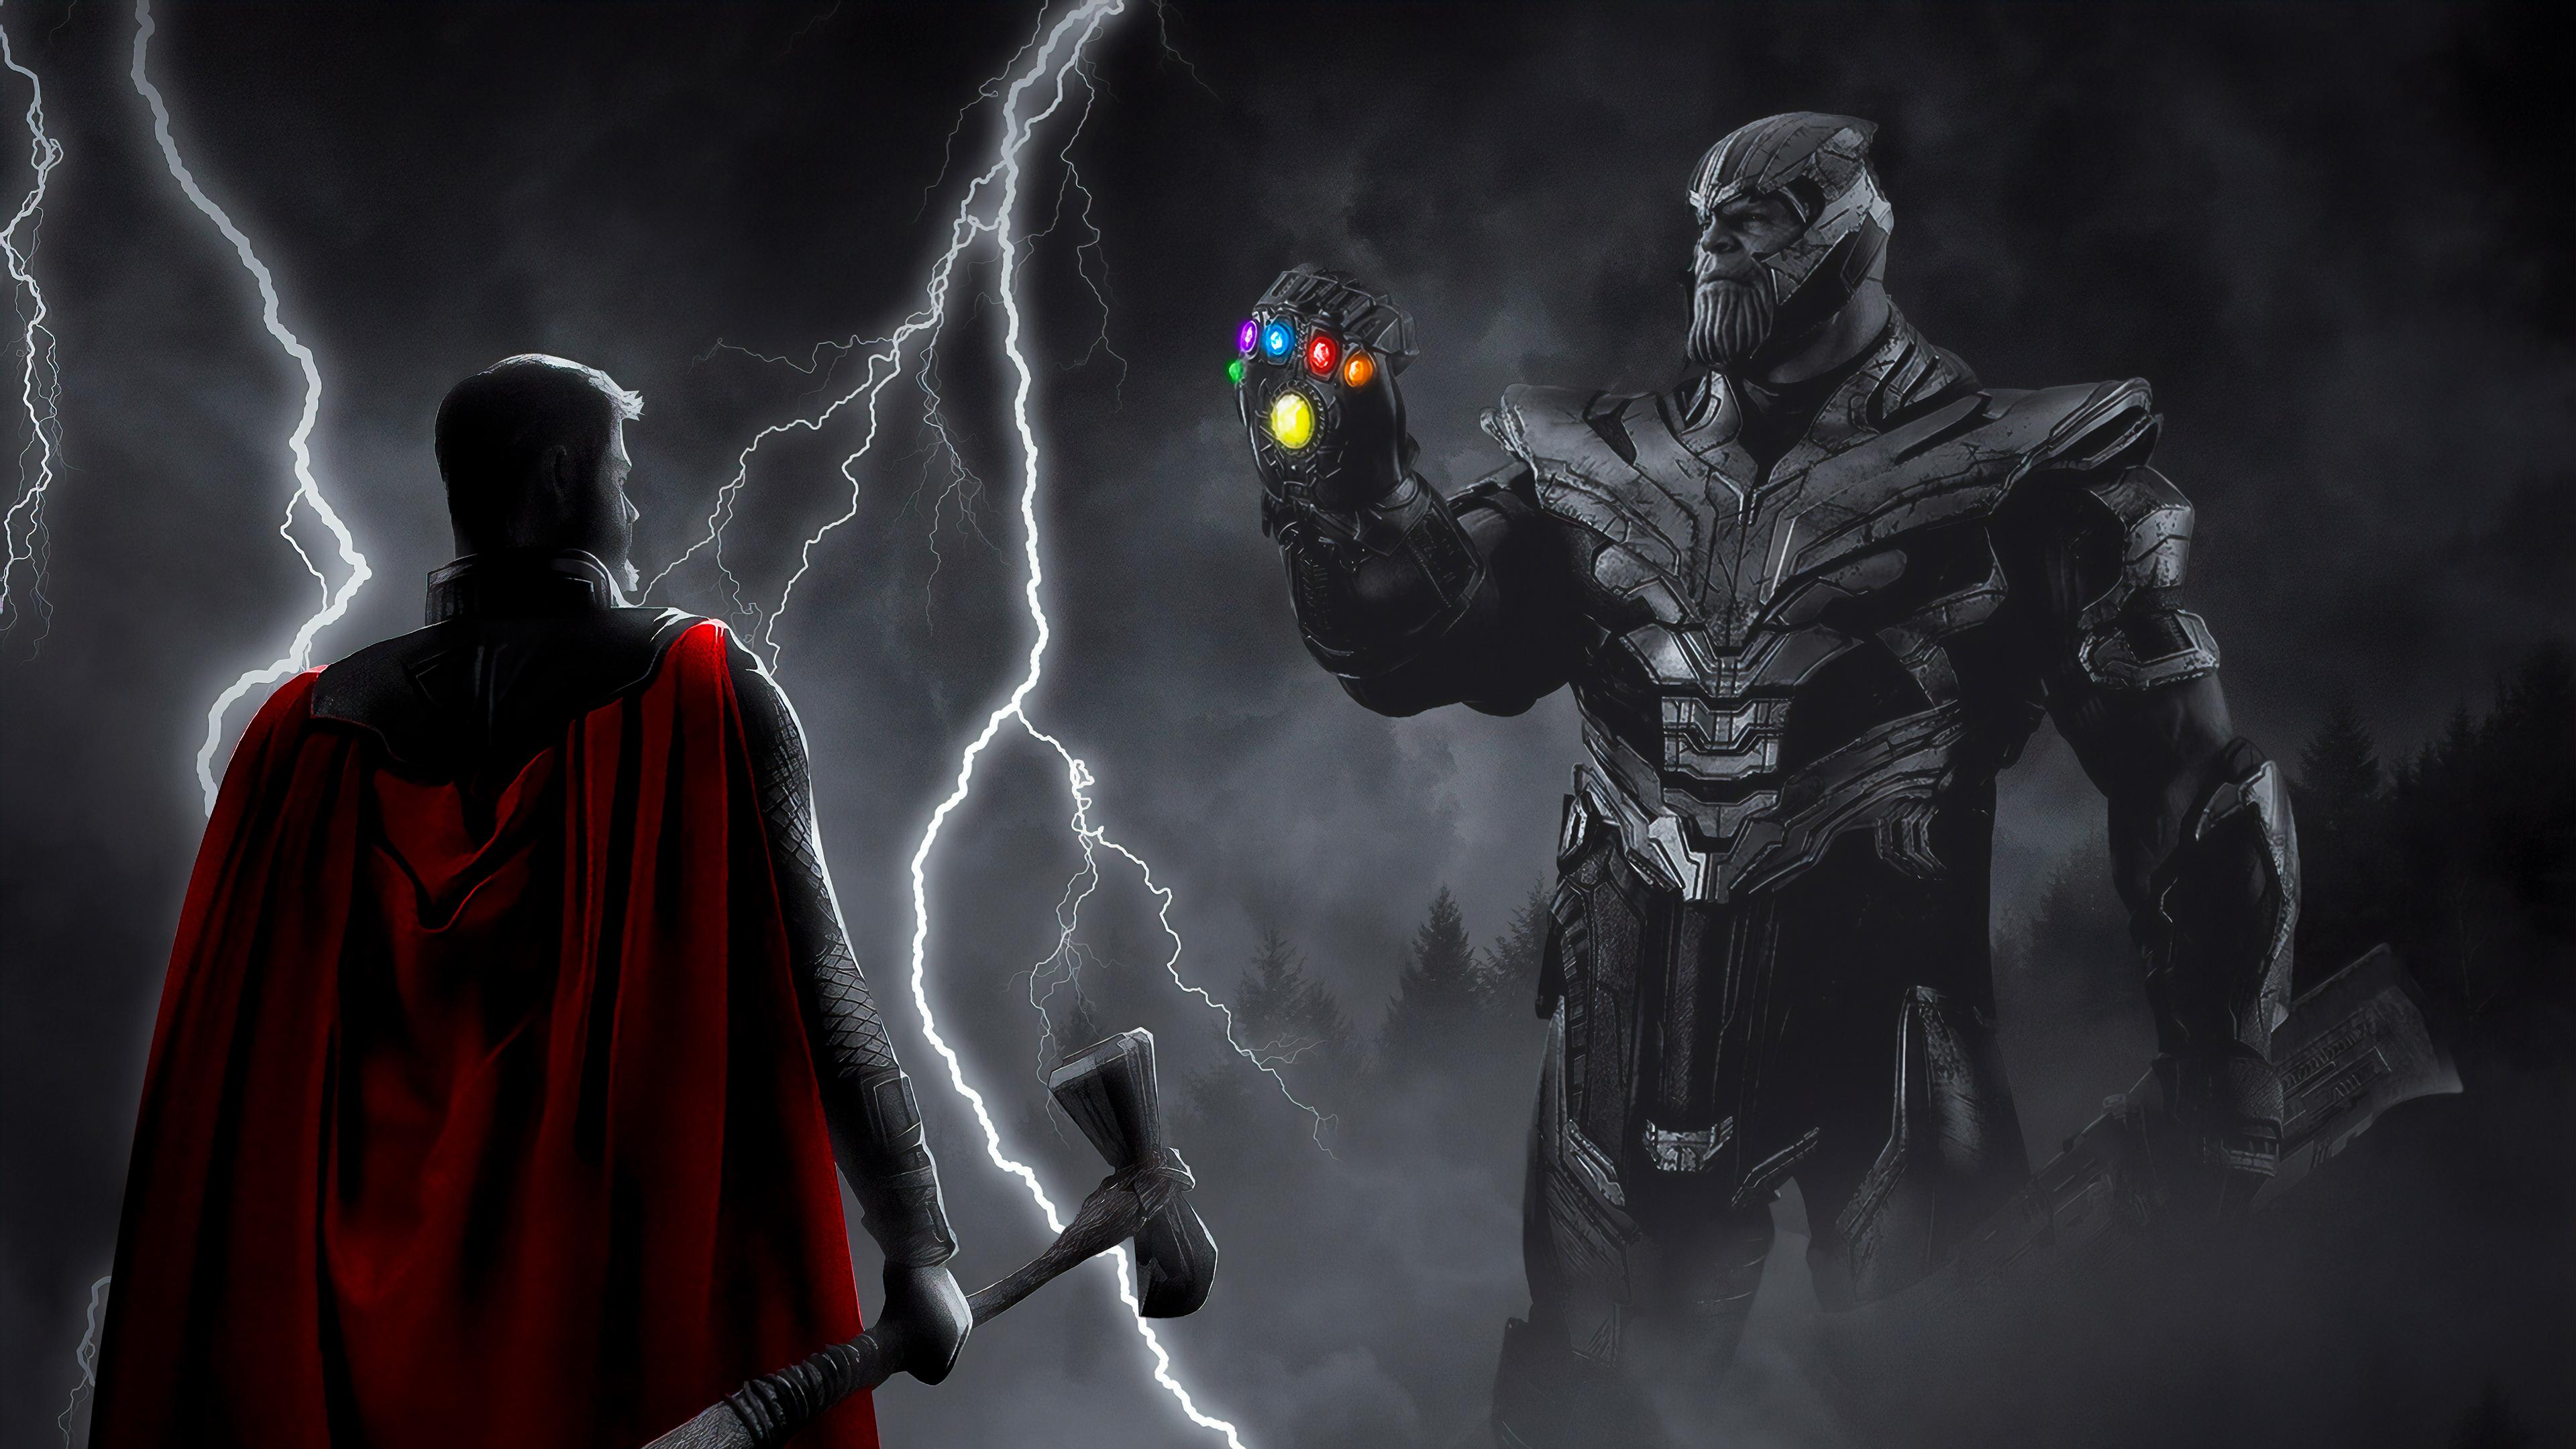 Thor Vs Thanos War 4k Hd Superheroes 4k Wallpapers Images